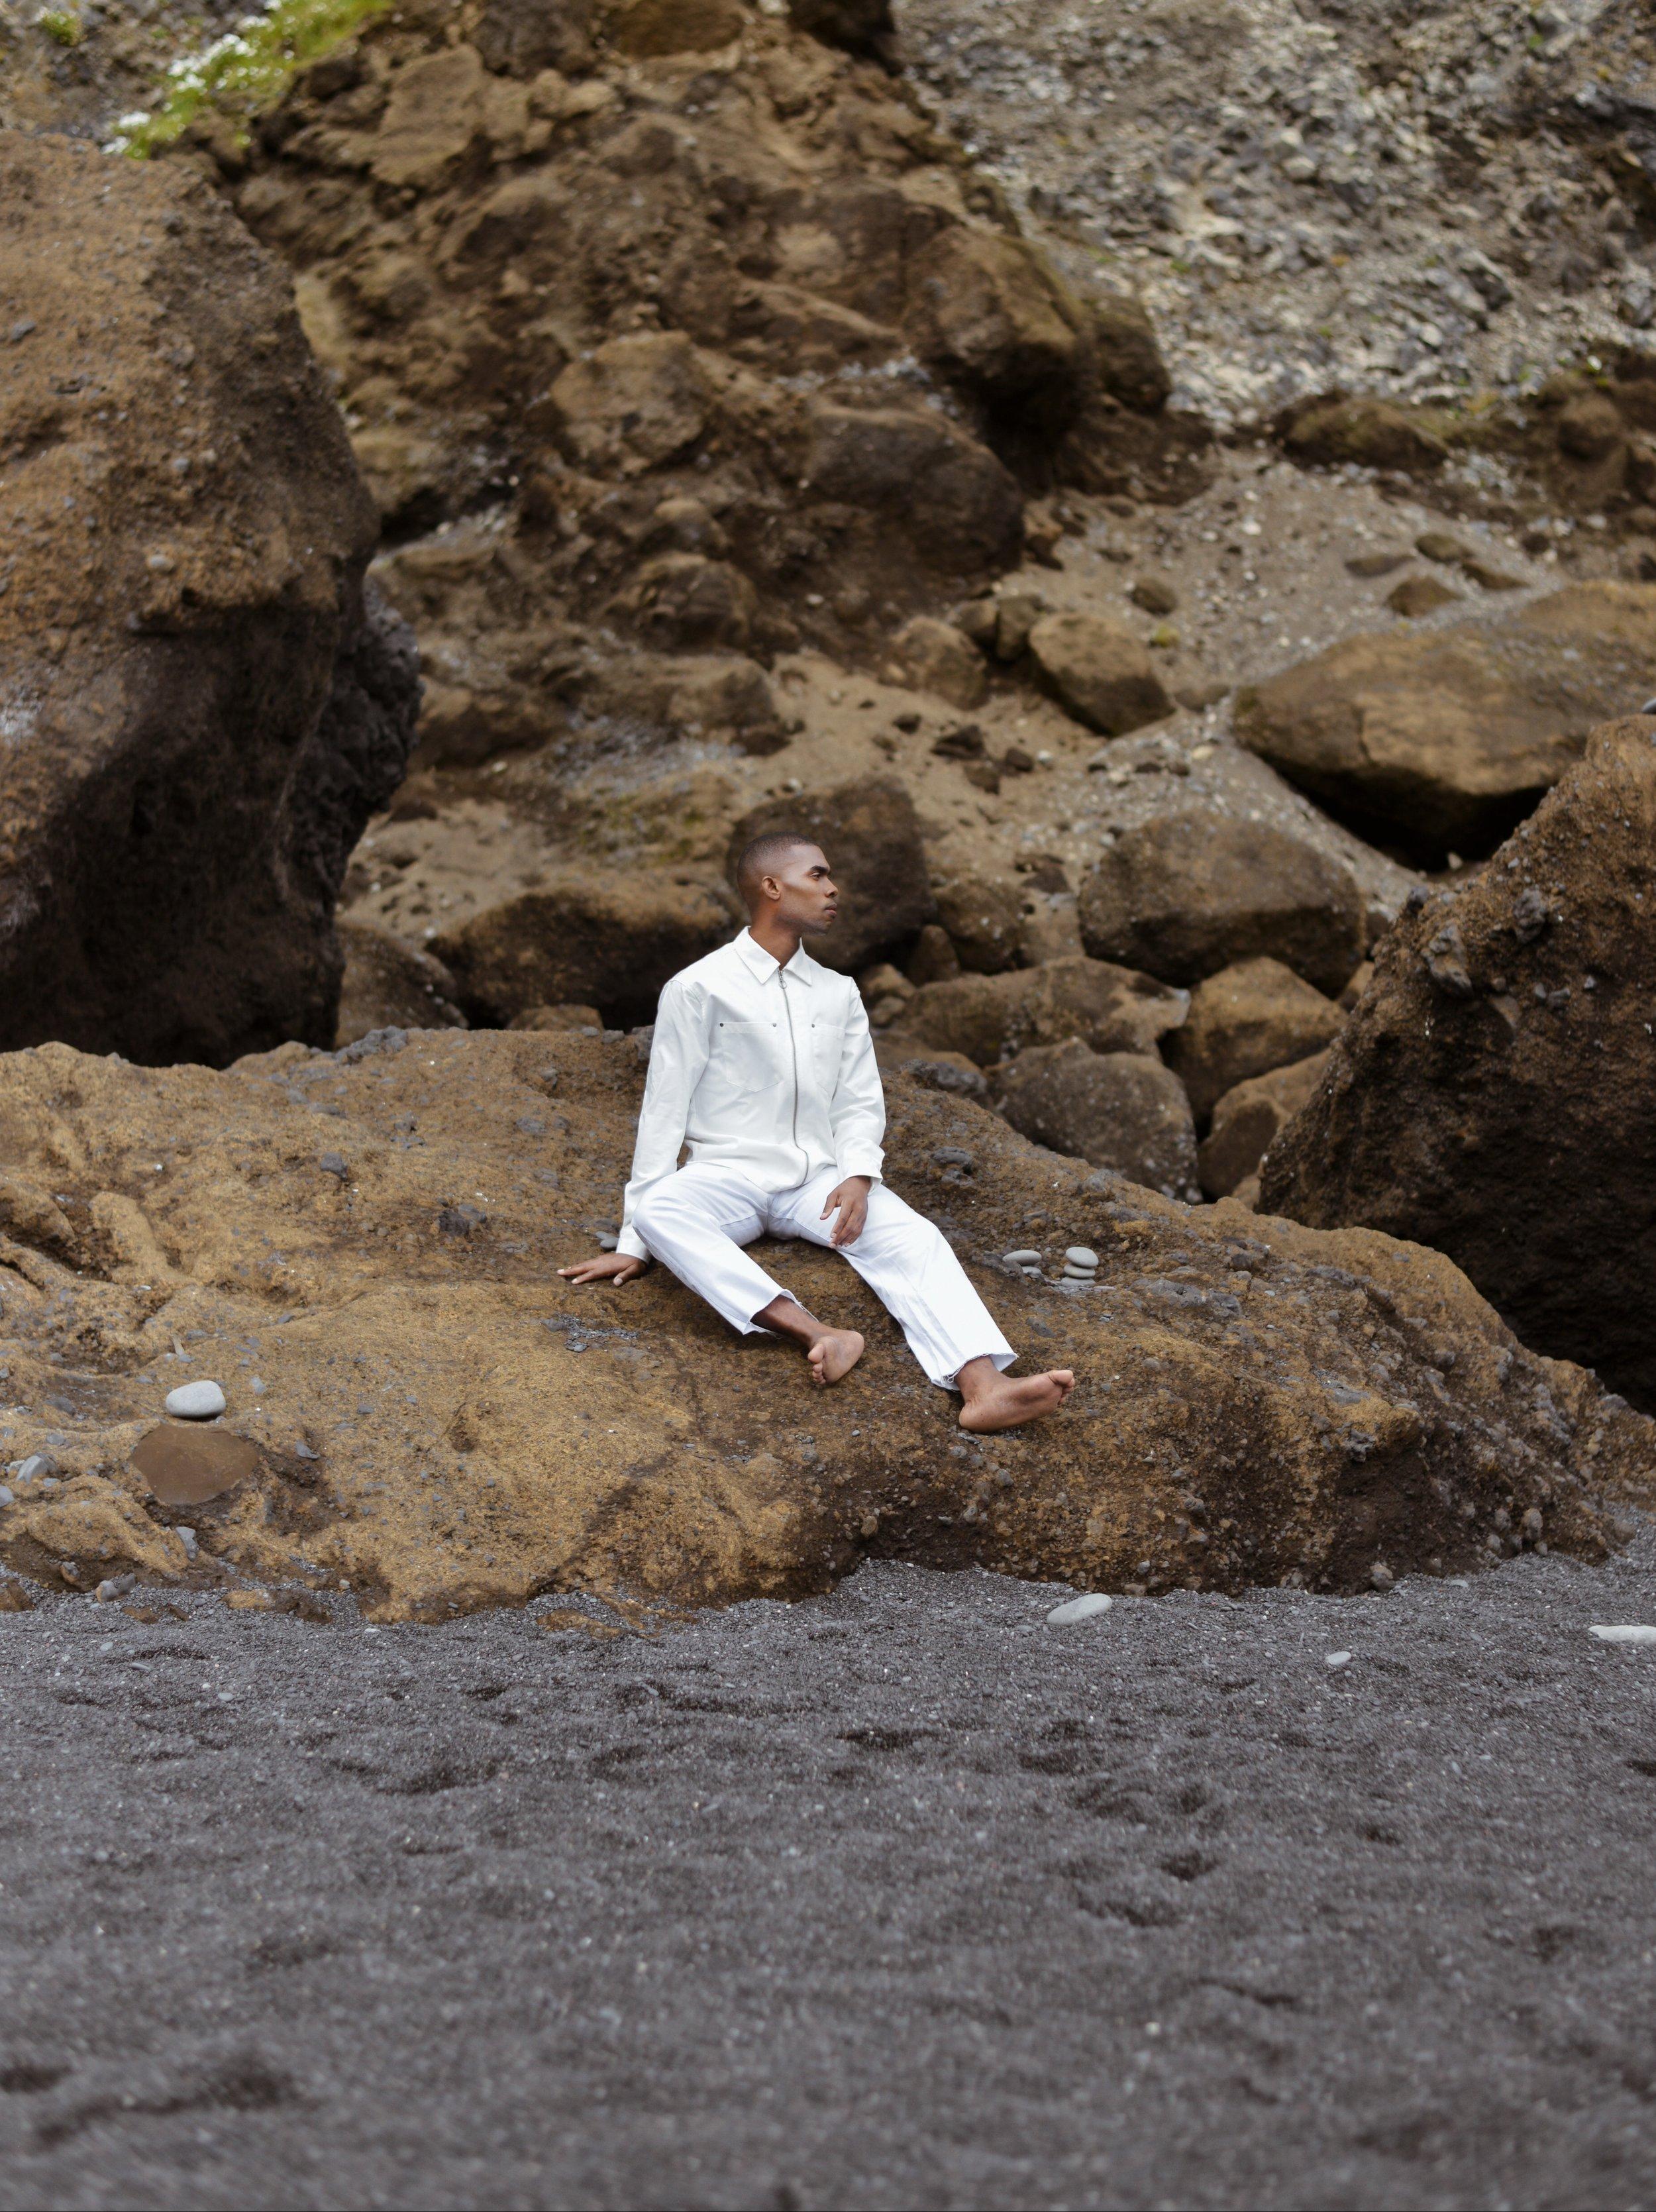 The-Look-Principle-Editorial-Reynisfjara-Beach-14.jpg